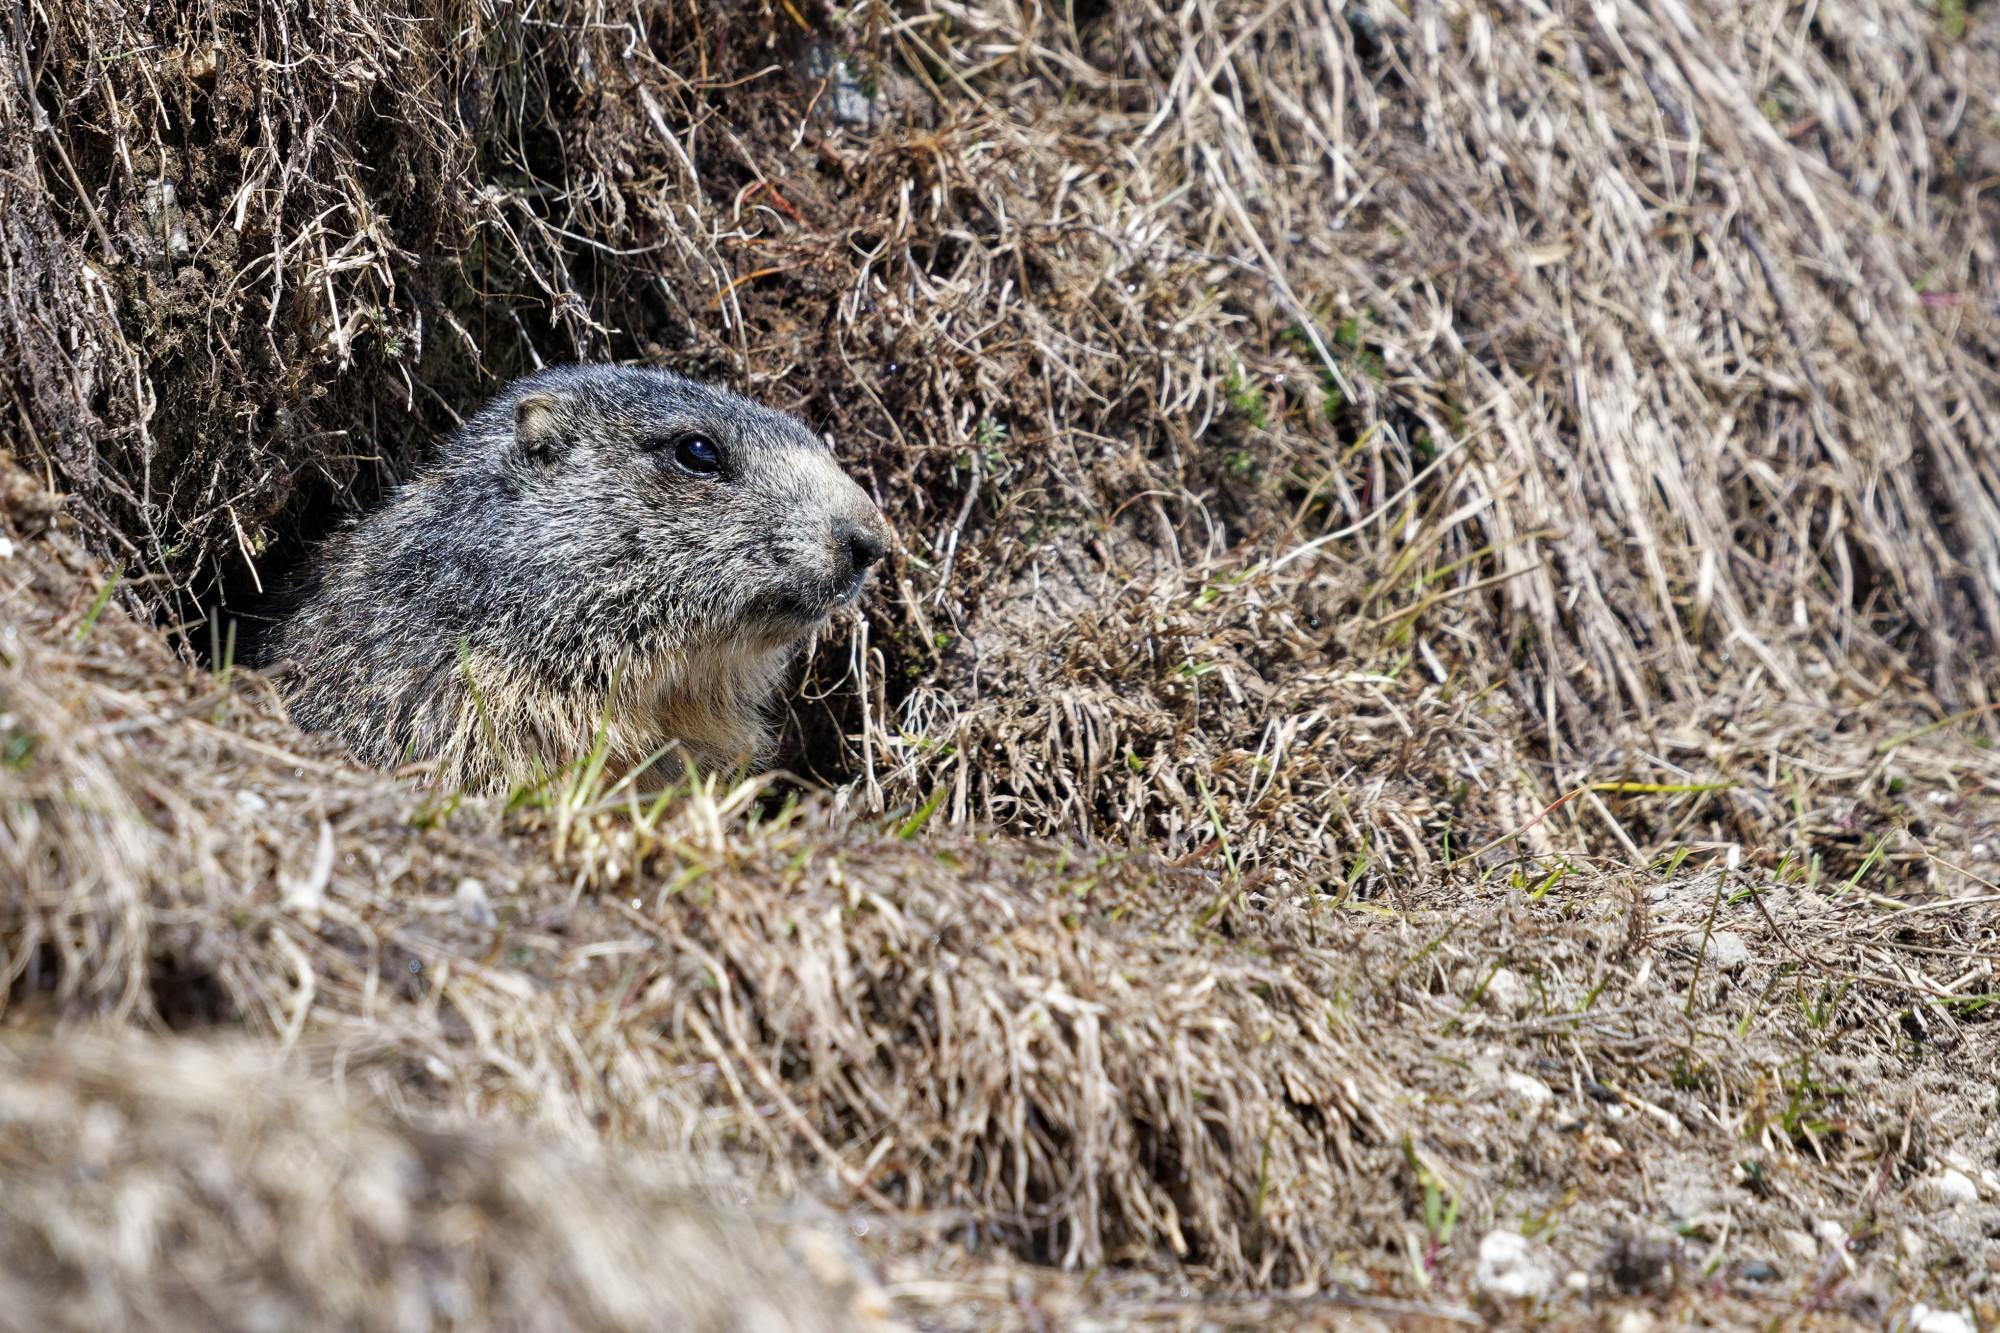 marmota marmota murmeltier tessin 2021-05-20